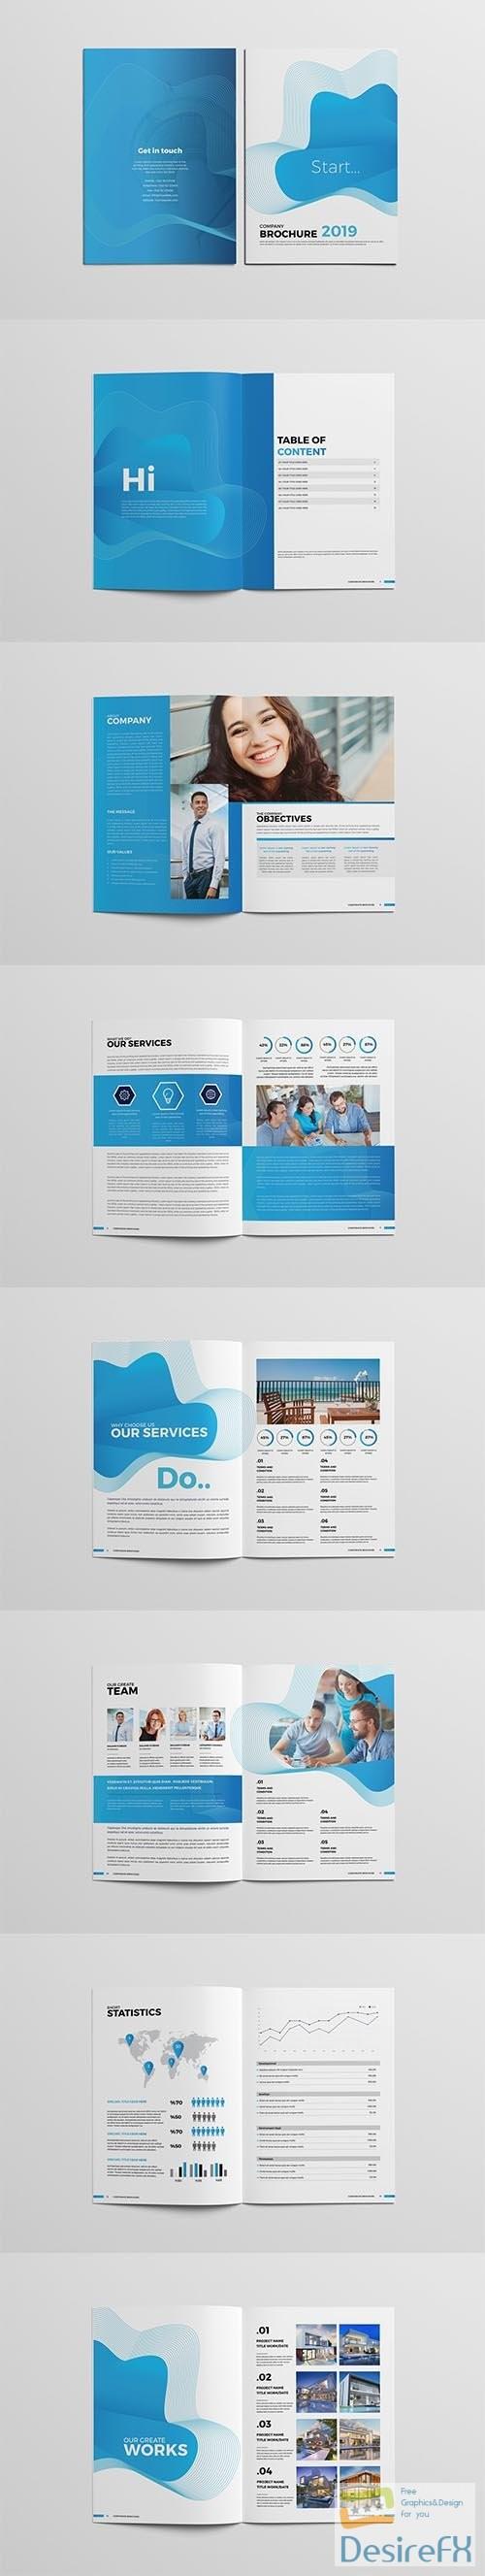 CreativeMarket - Corporate Business Brochure 3666070